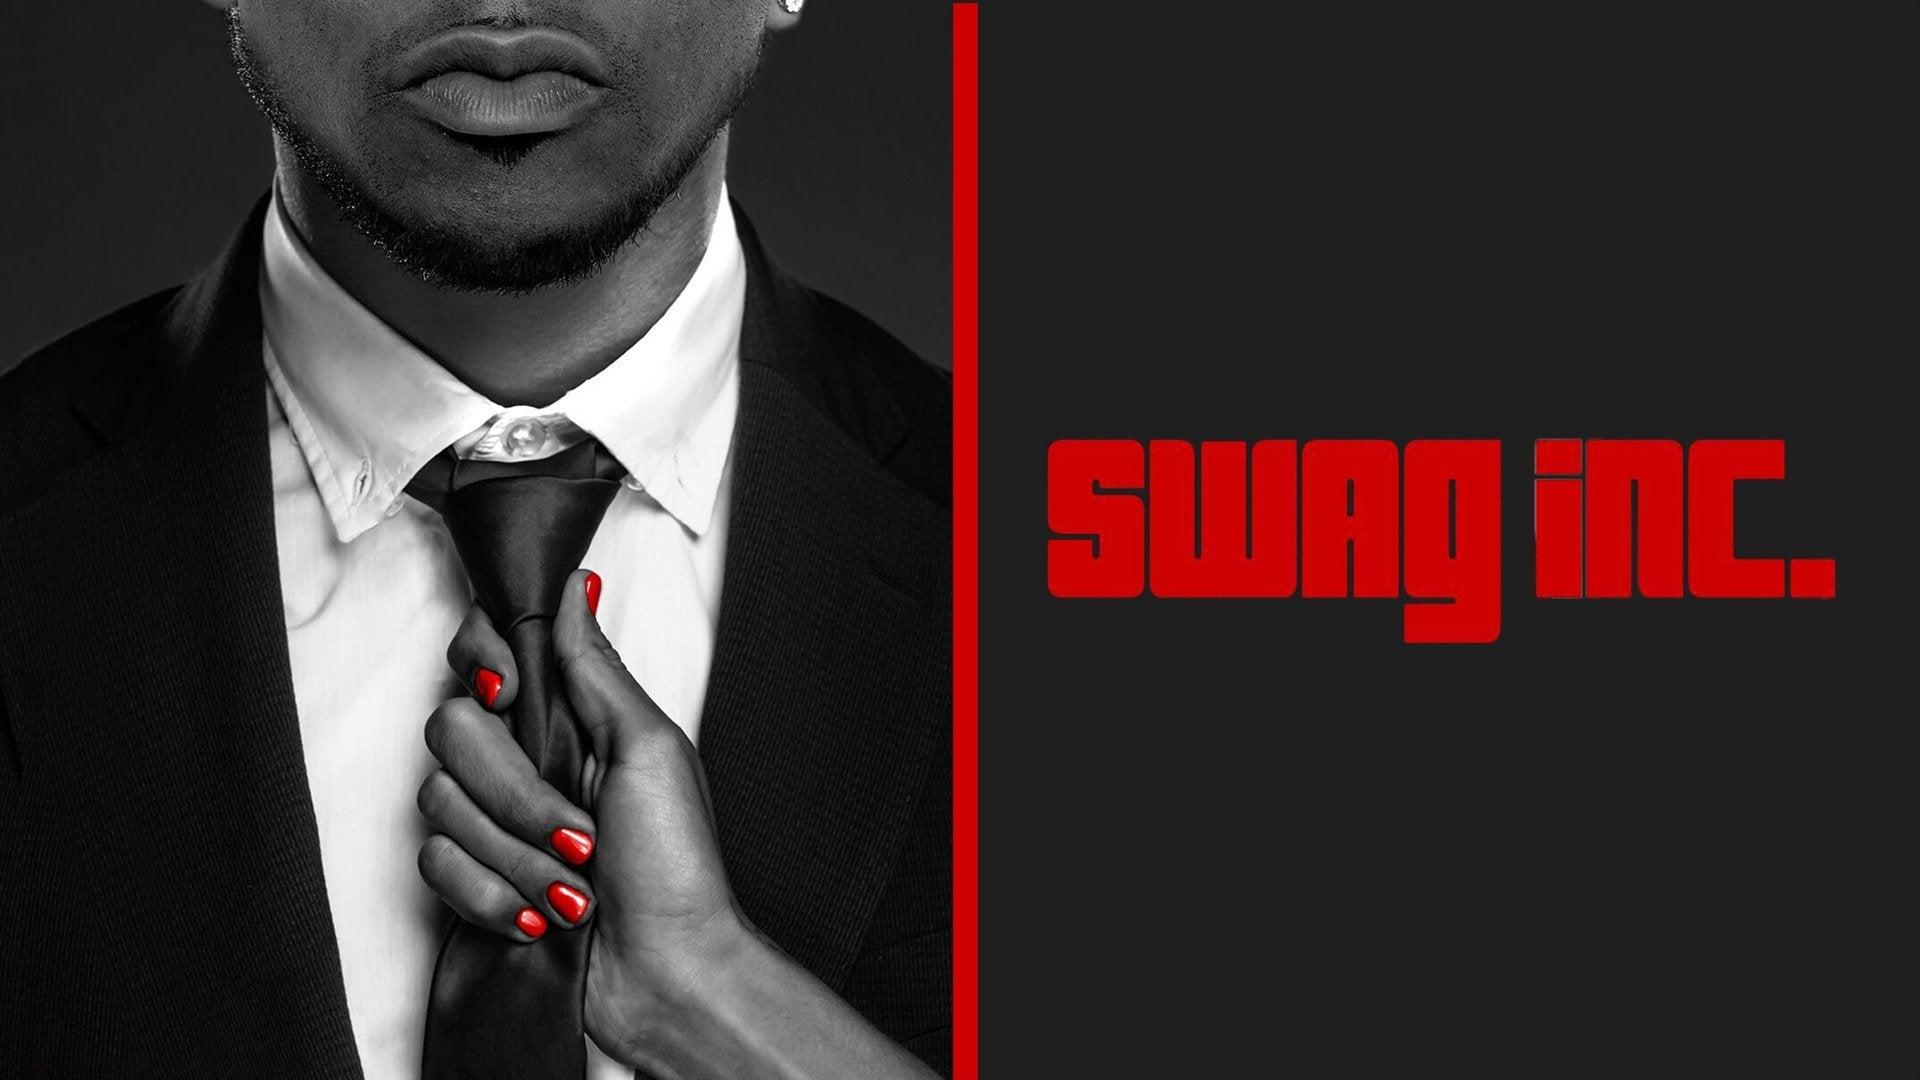 Swag Inc.